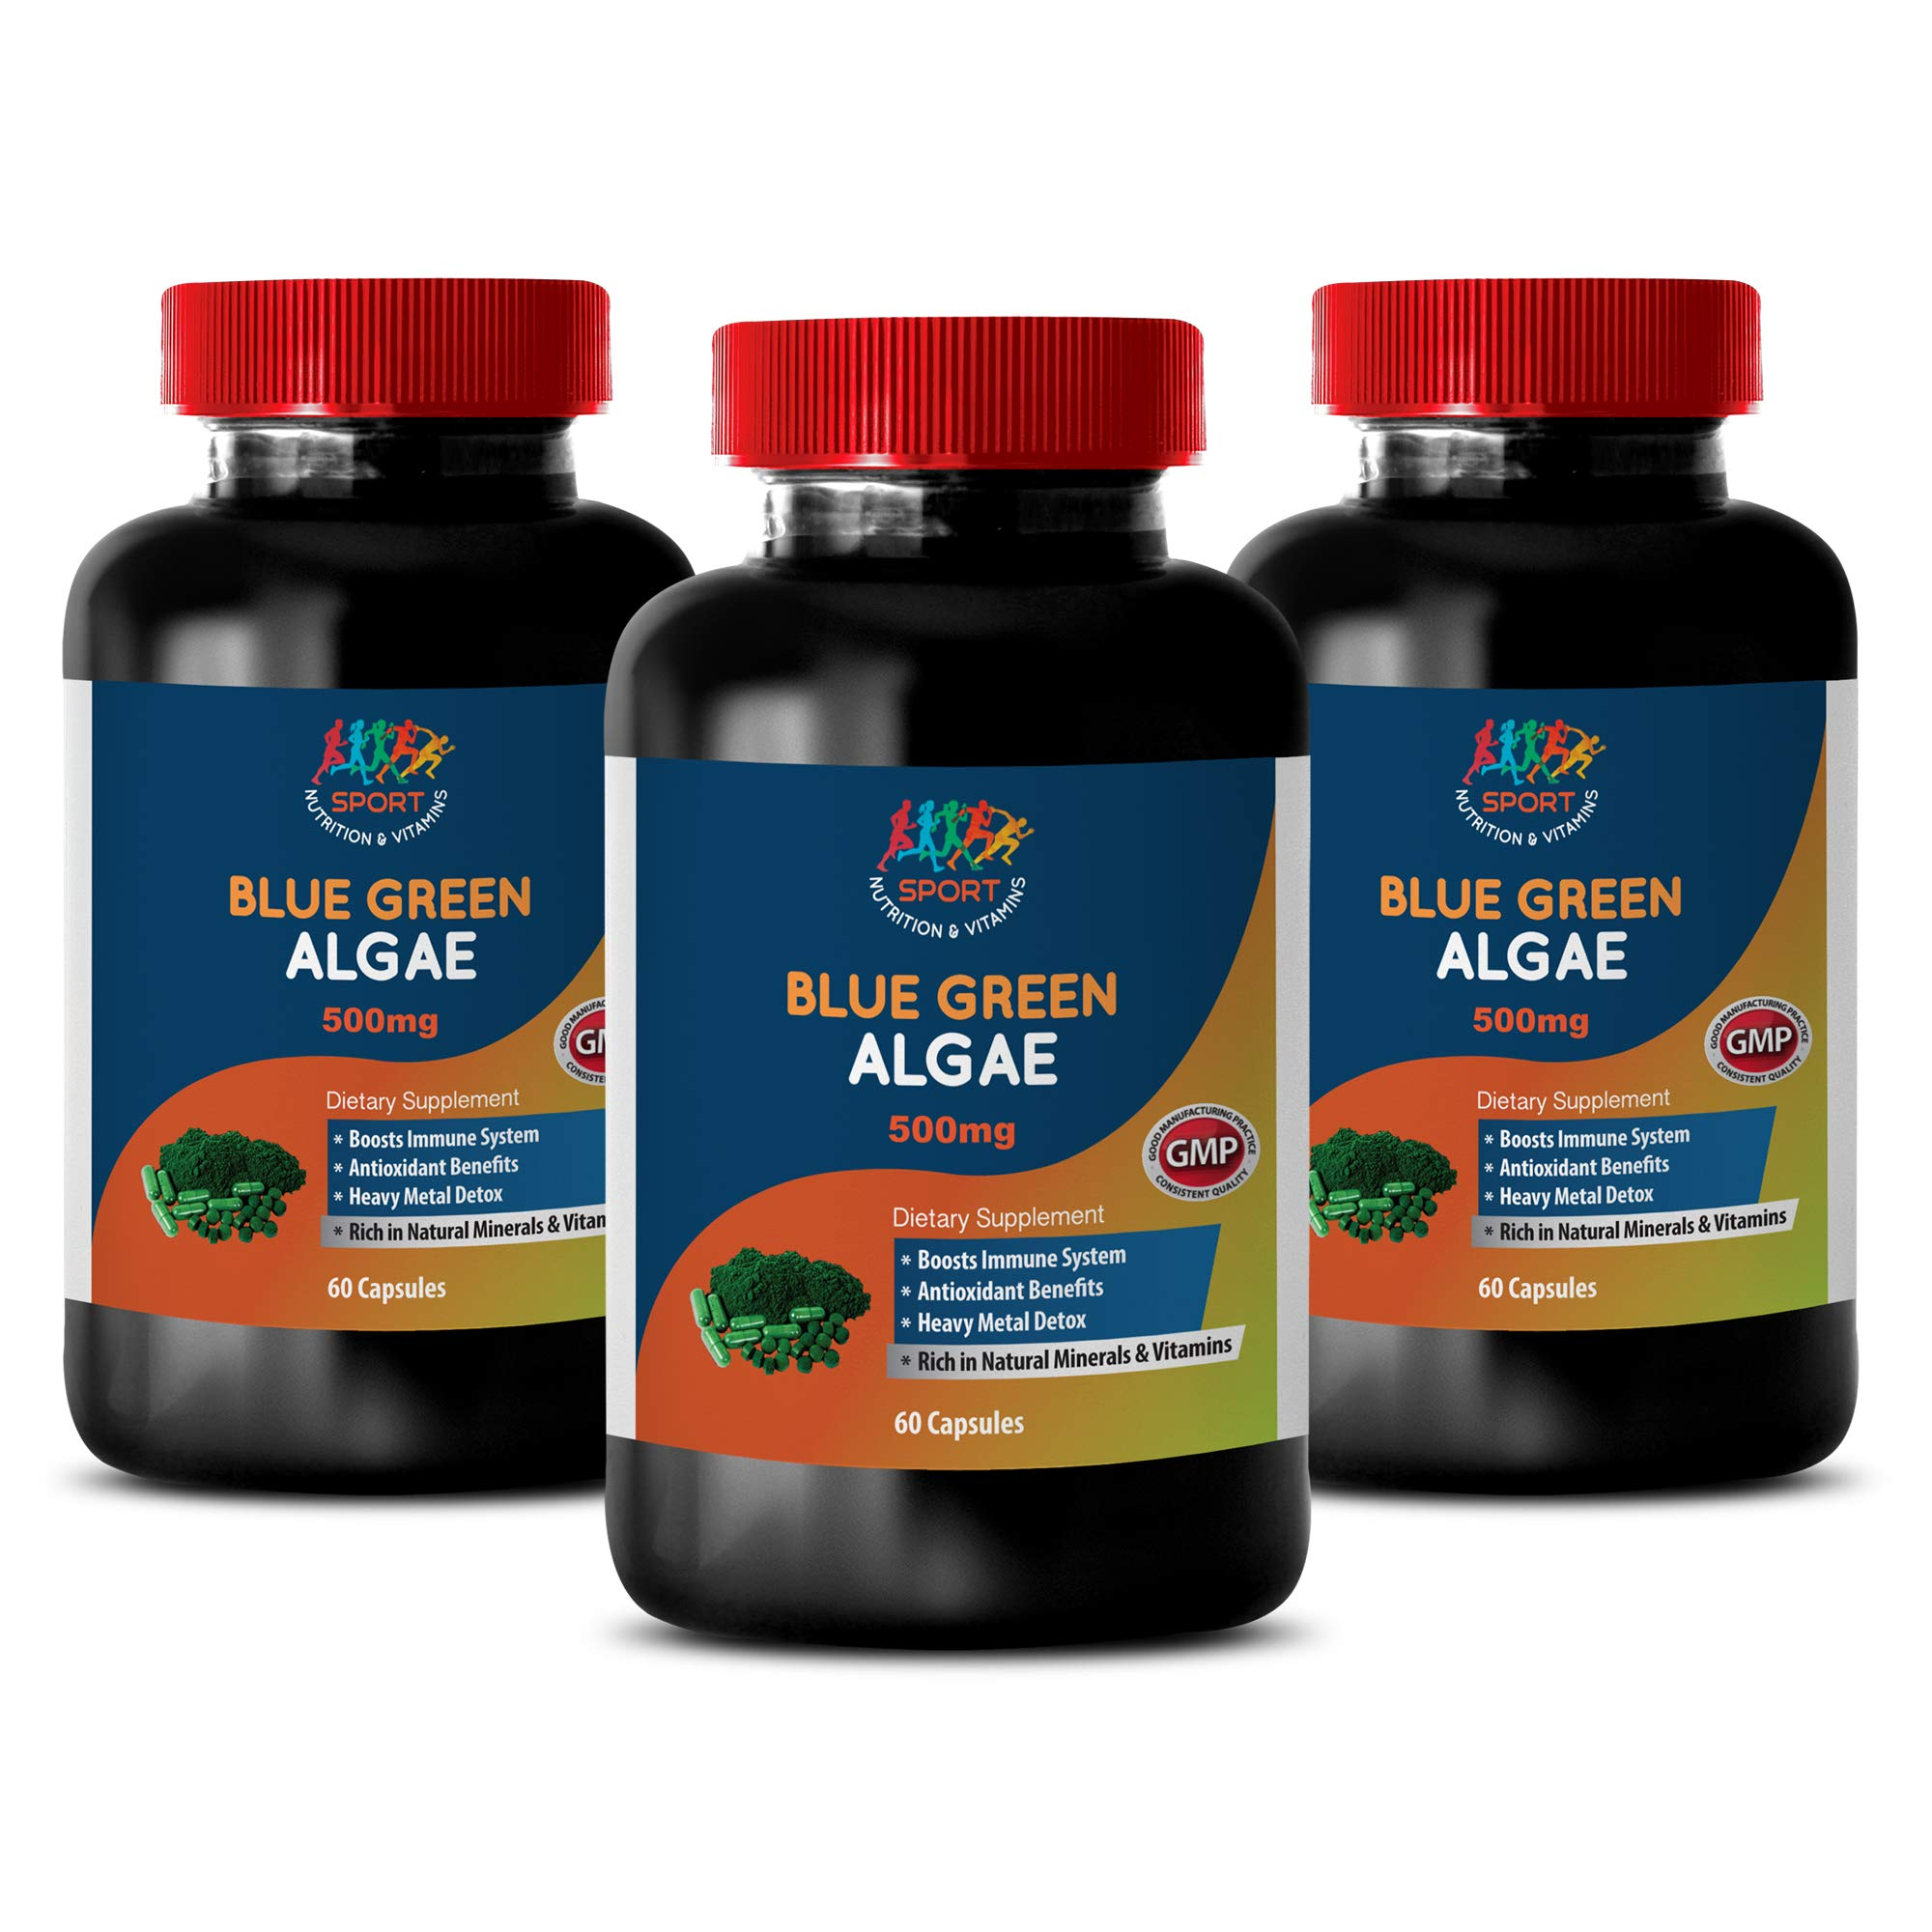 antioxidant Vitamins for Men - Organic Blue Green Algae 500mg - stem Cell Skin Repair - 3 Bottles 180 Capsules